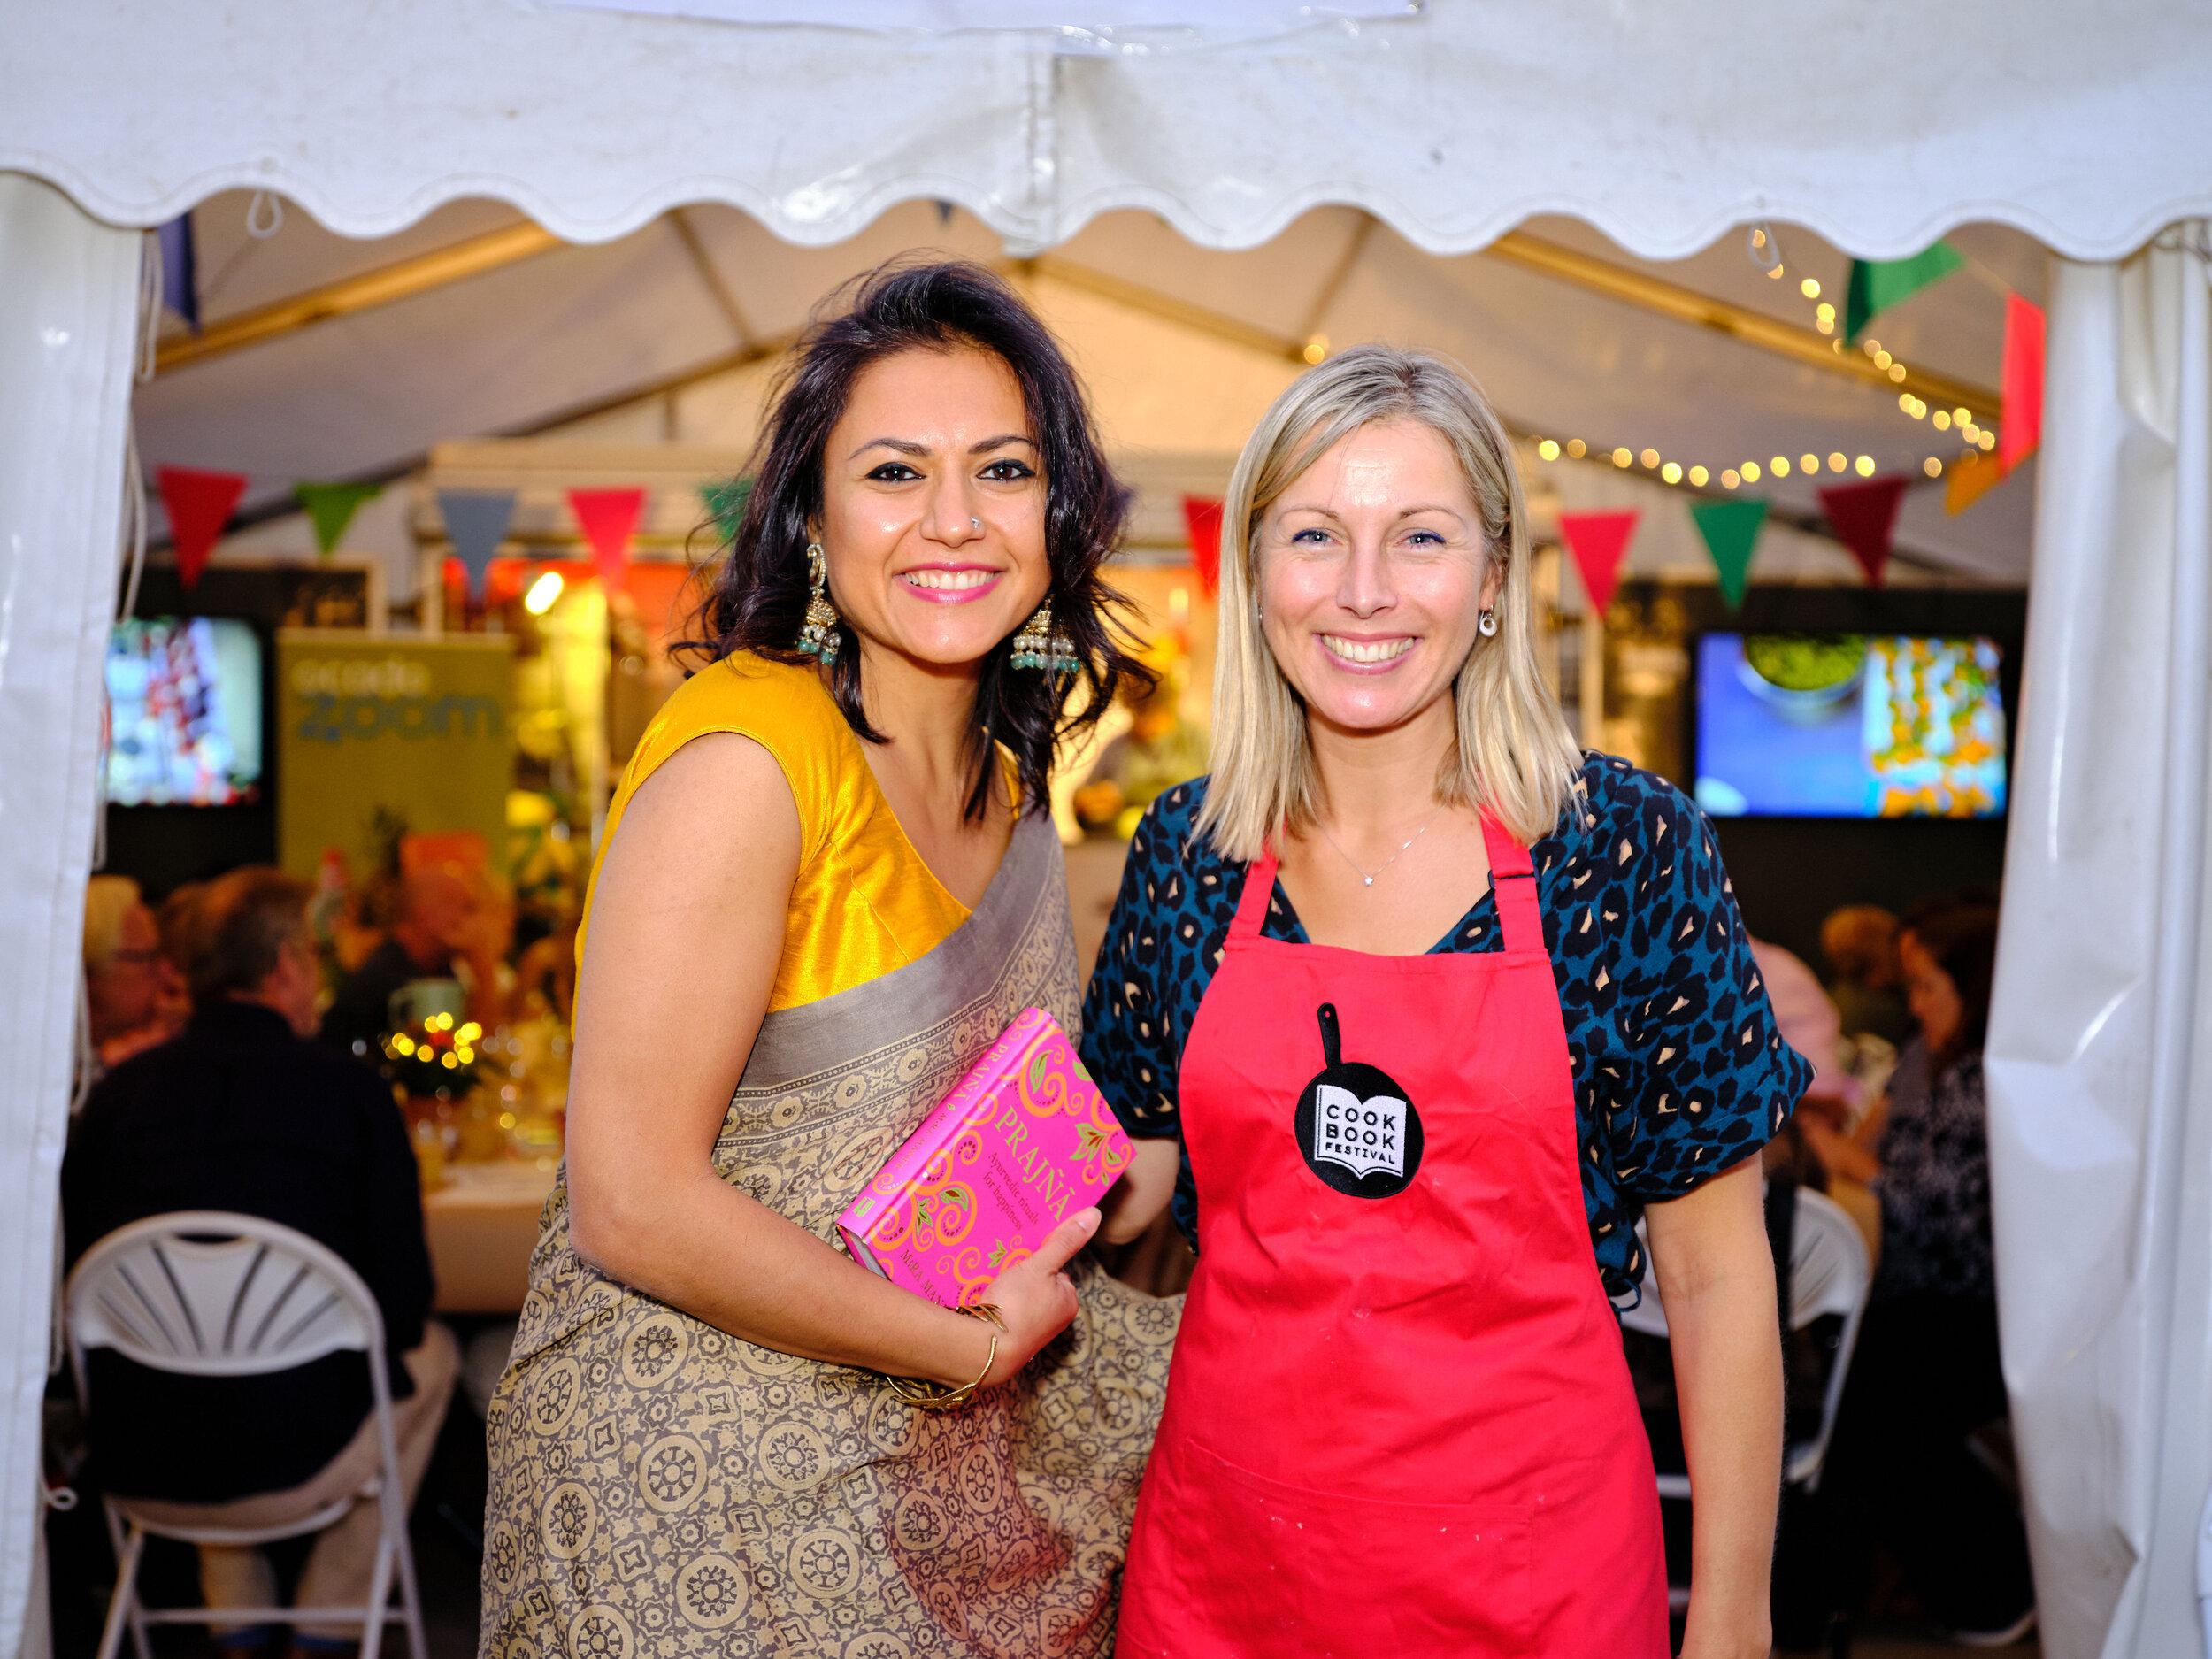 CookbookFestival20190173.jpg